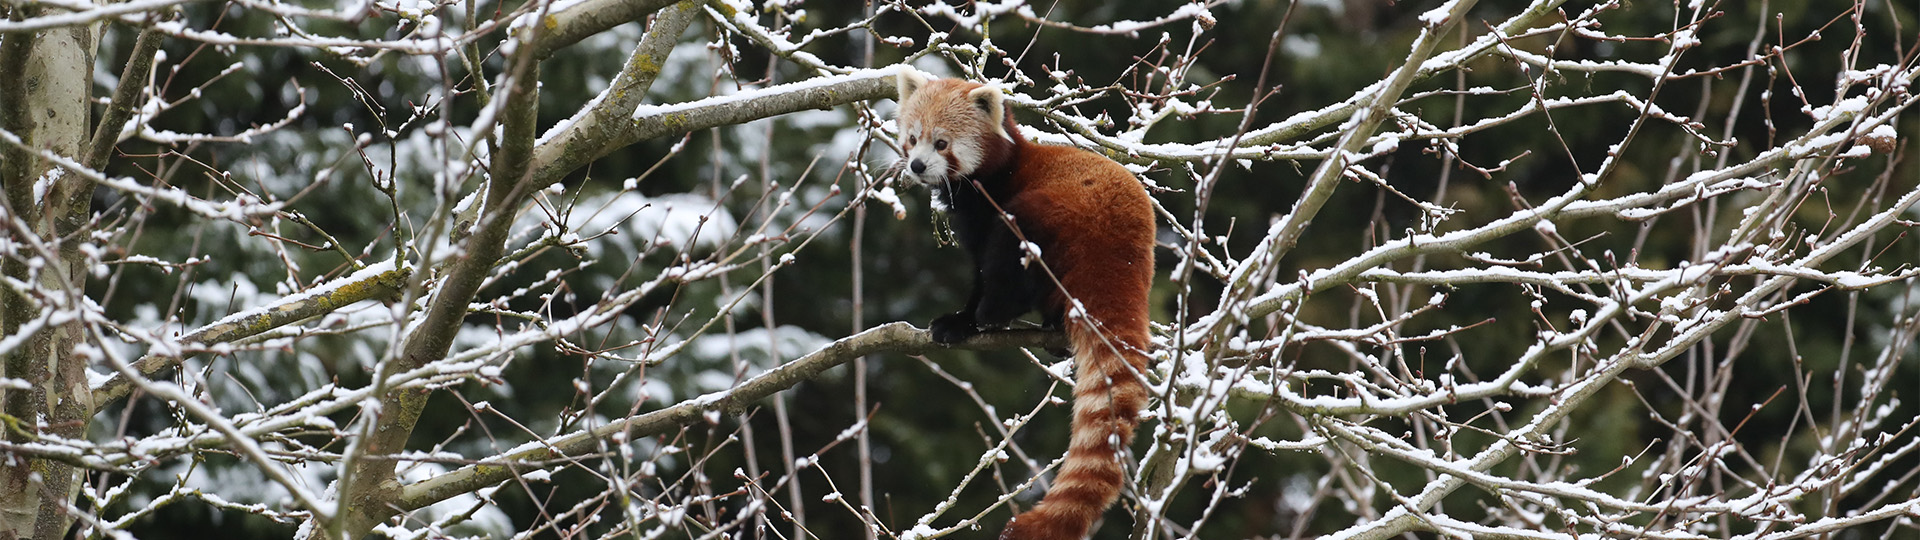 panda_roux